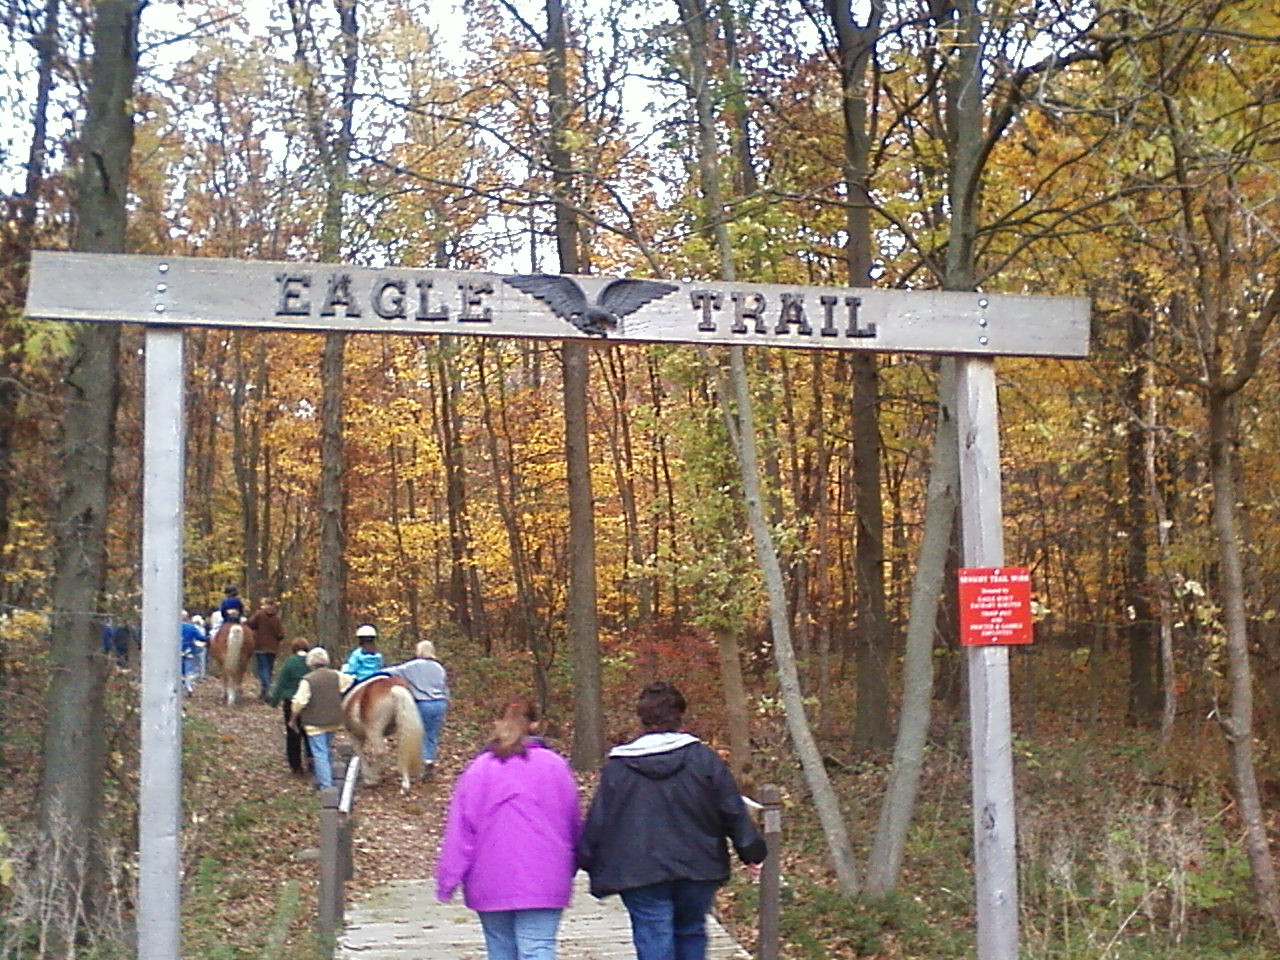 Trail ride 10-22-09 (2).jpg